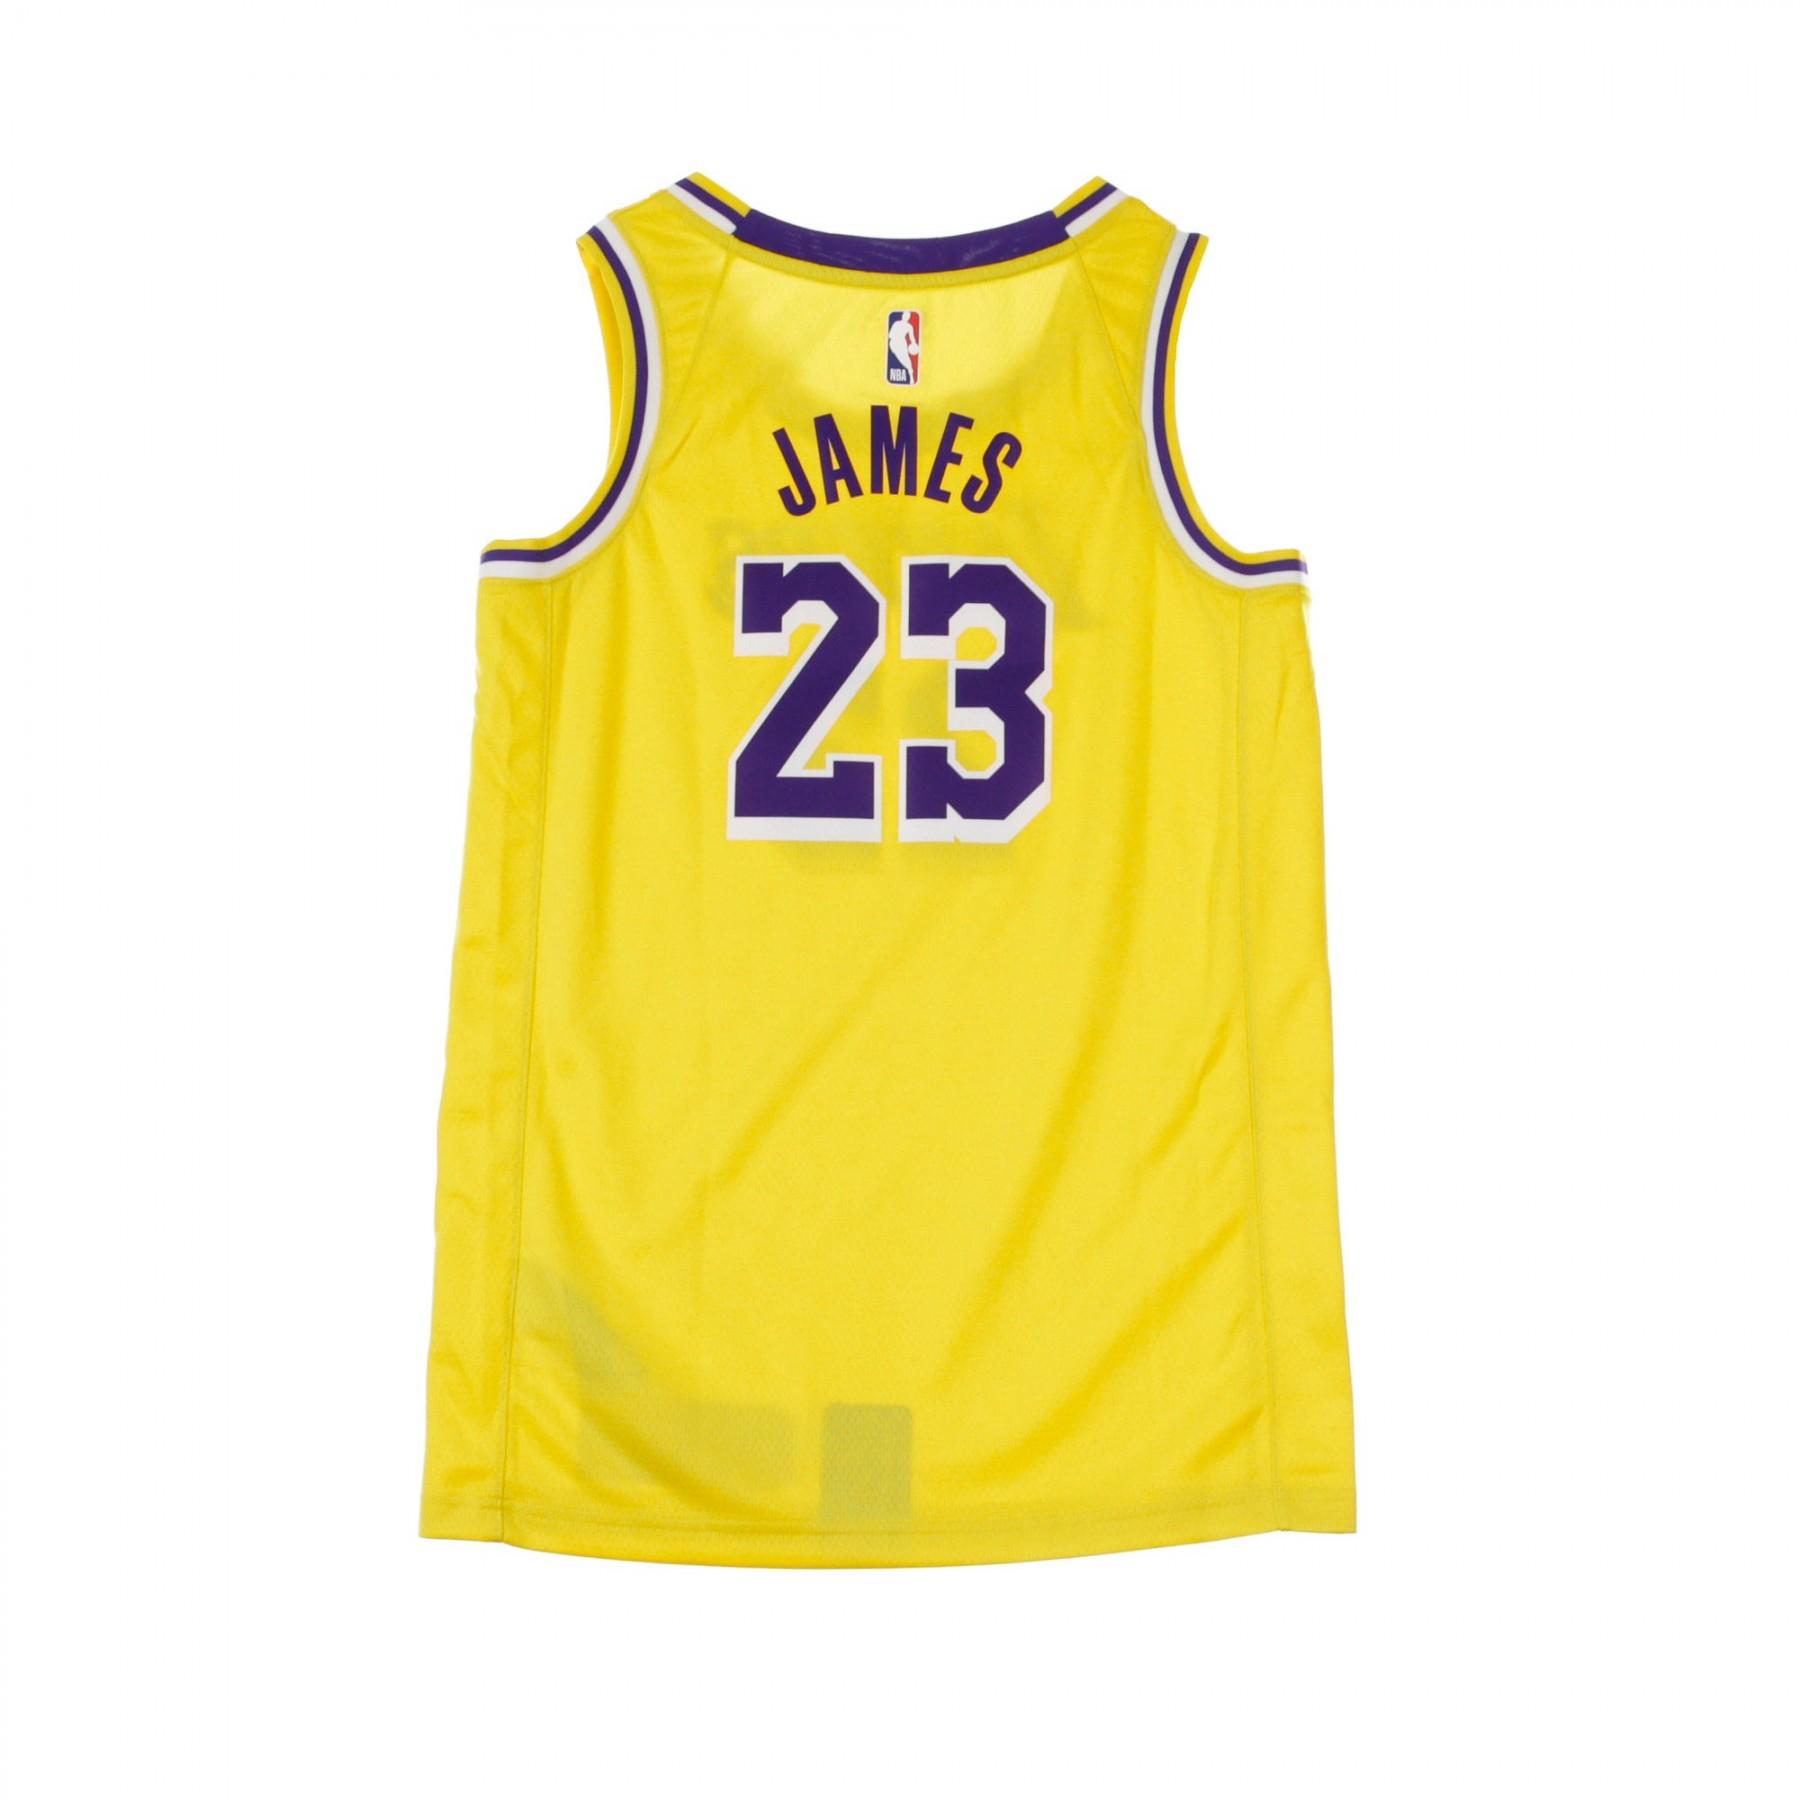 quality design 705fe 11a15 BASKET NBA SWINGMAN JERSEY NO23 LEBRON JAMES LOSLAK ROAD AMARILLO/FIELD  PURPLE/WHITE